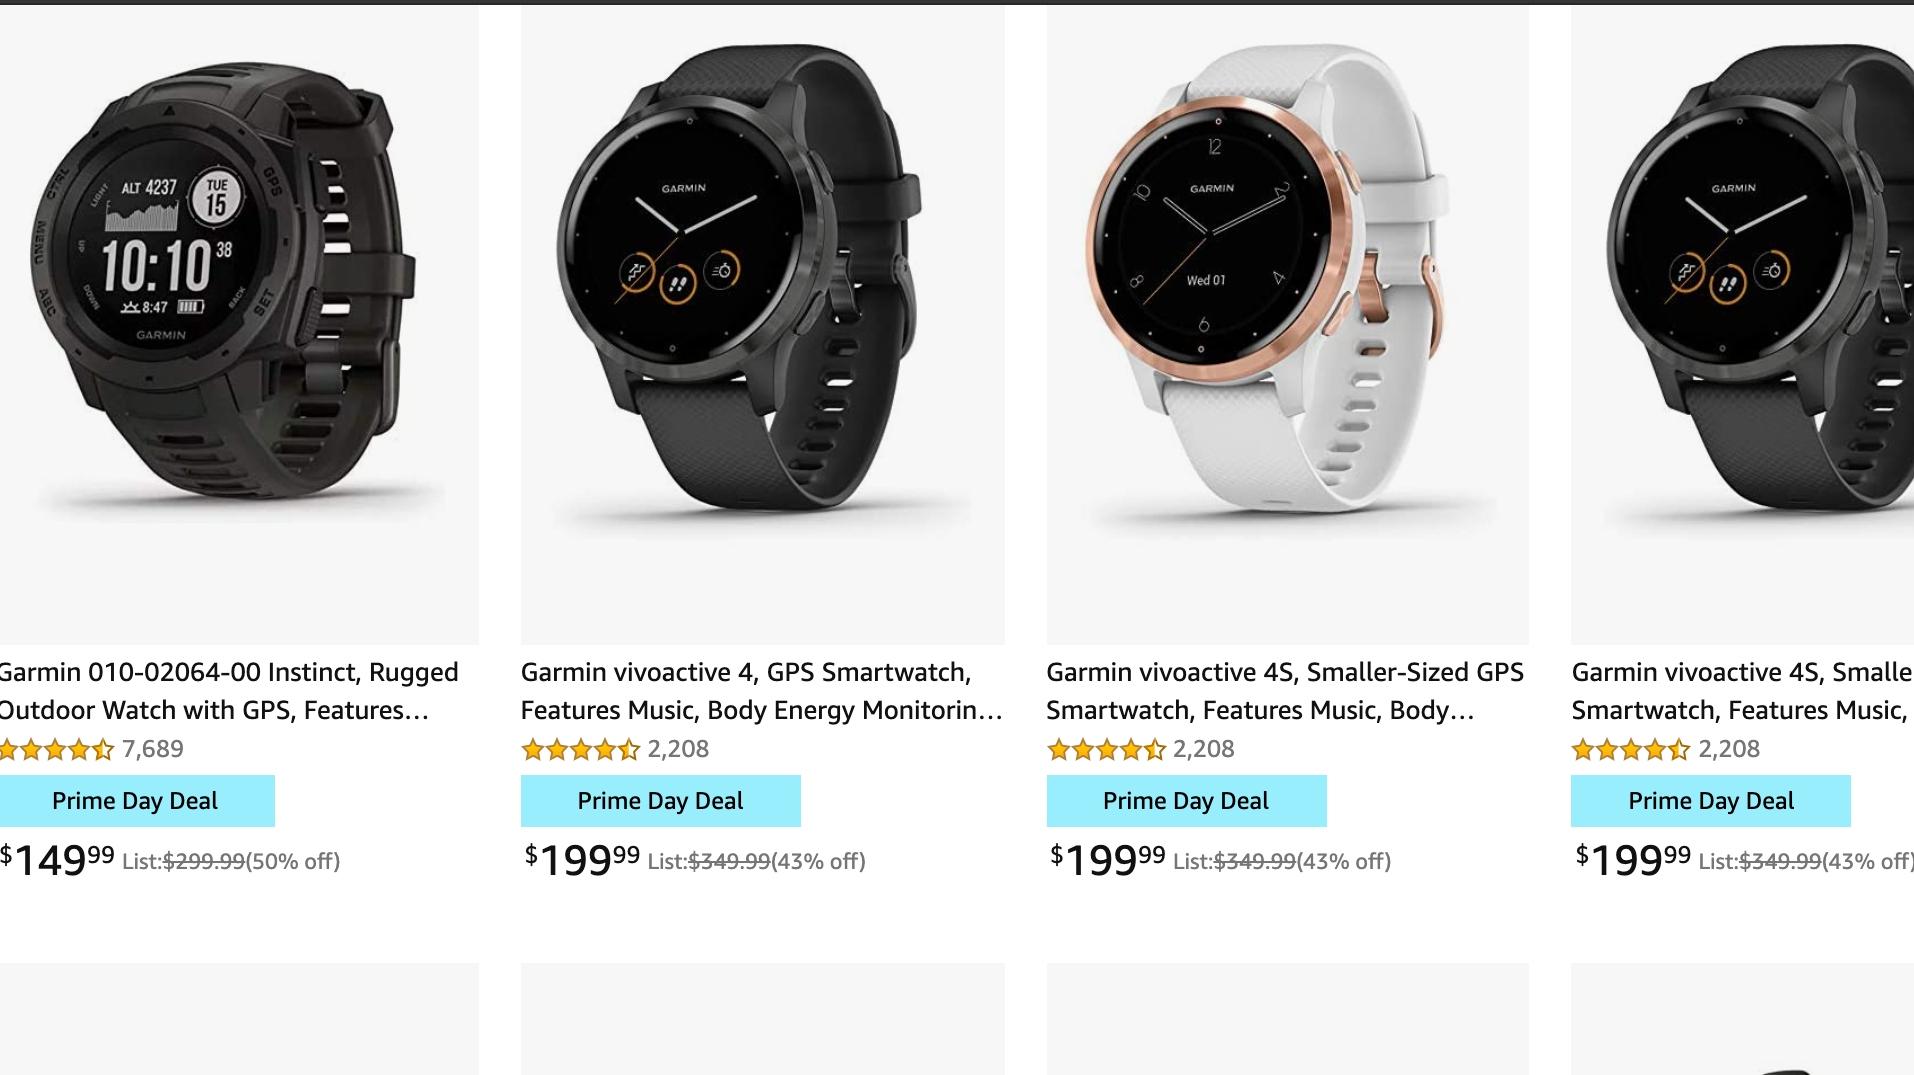 Garmin Amazon Prime Day Deals